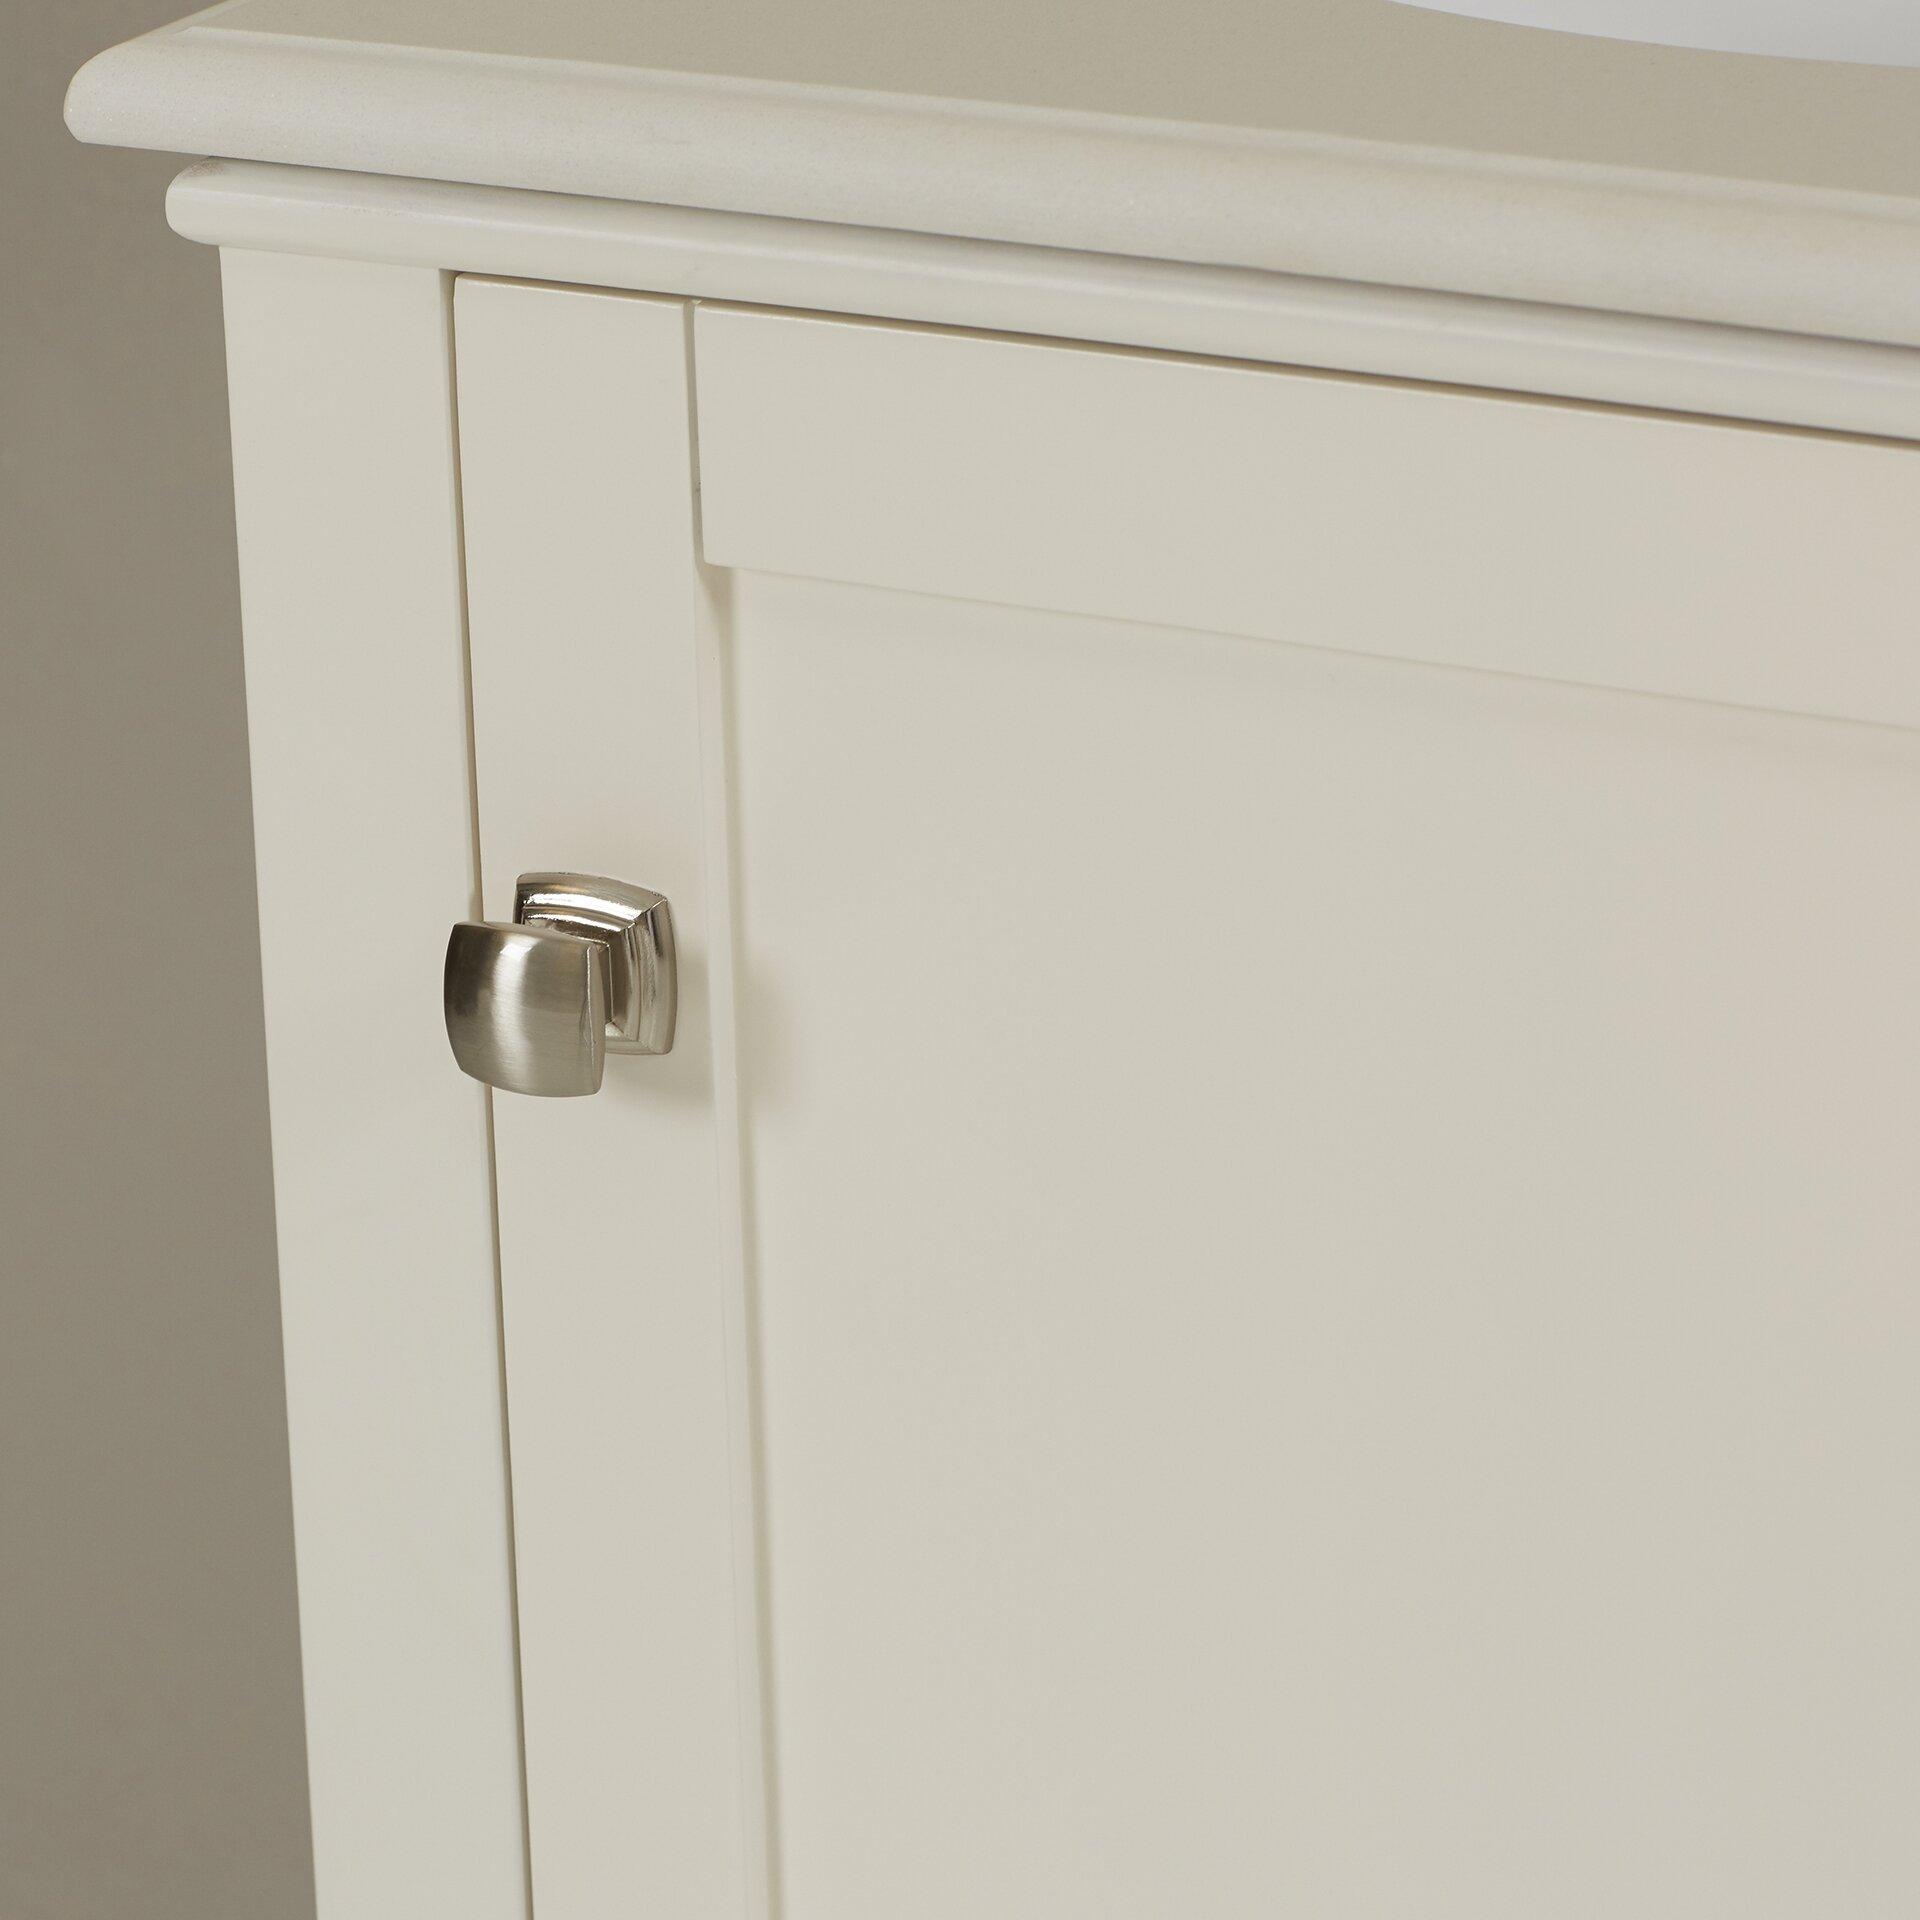 "Beachcrest Home Gotha 3 Light Vanity Light Reviews: Beachcrest Home Hendry 21"" Single Bathroom Vanity Set & Reviews"